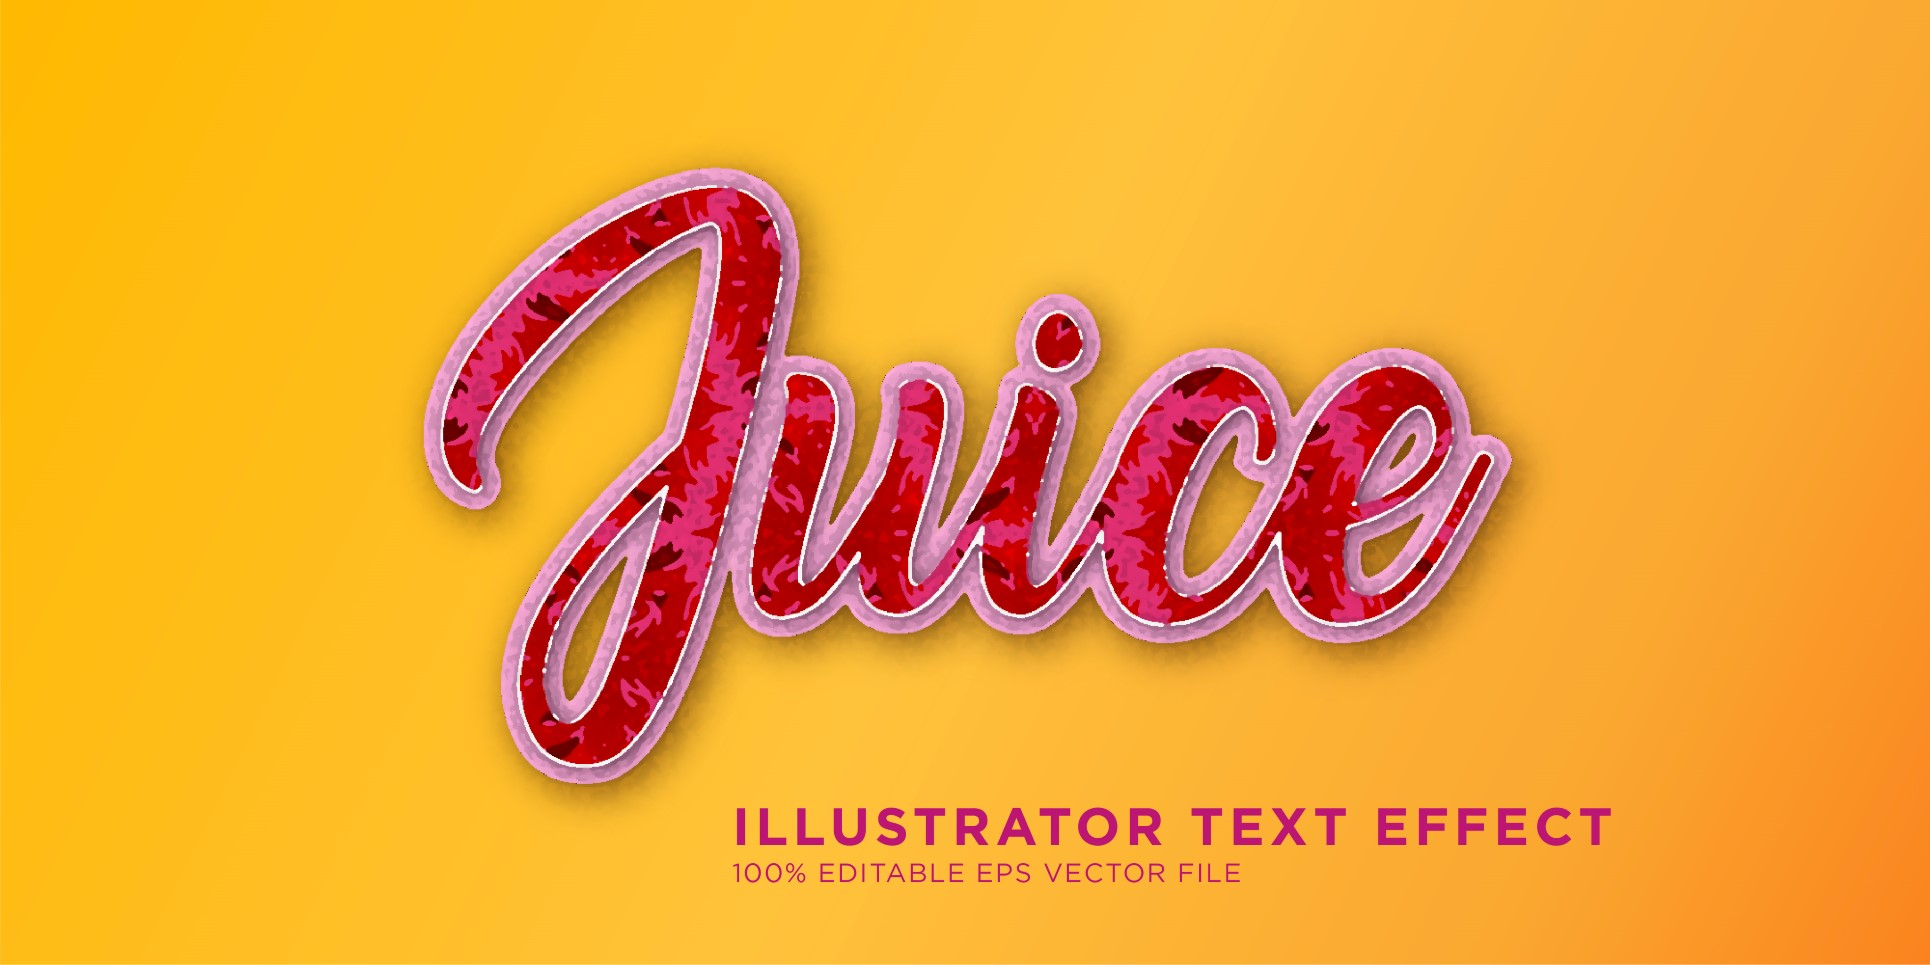 Juice illustrator Text Effect Illustration